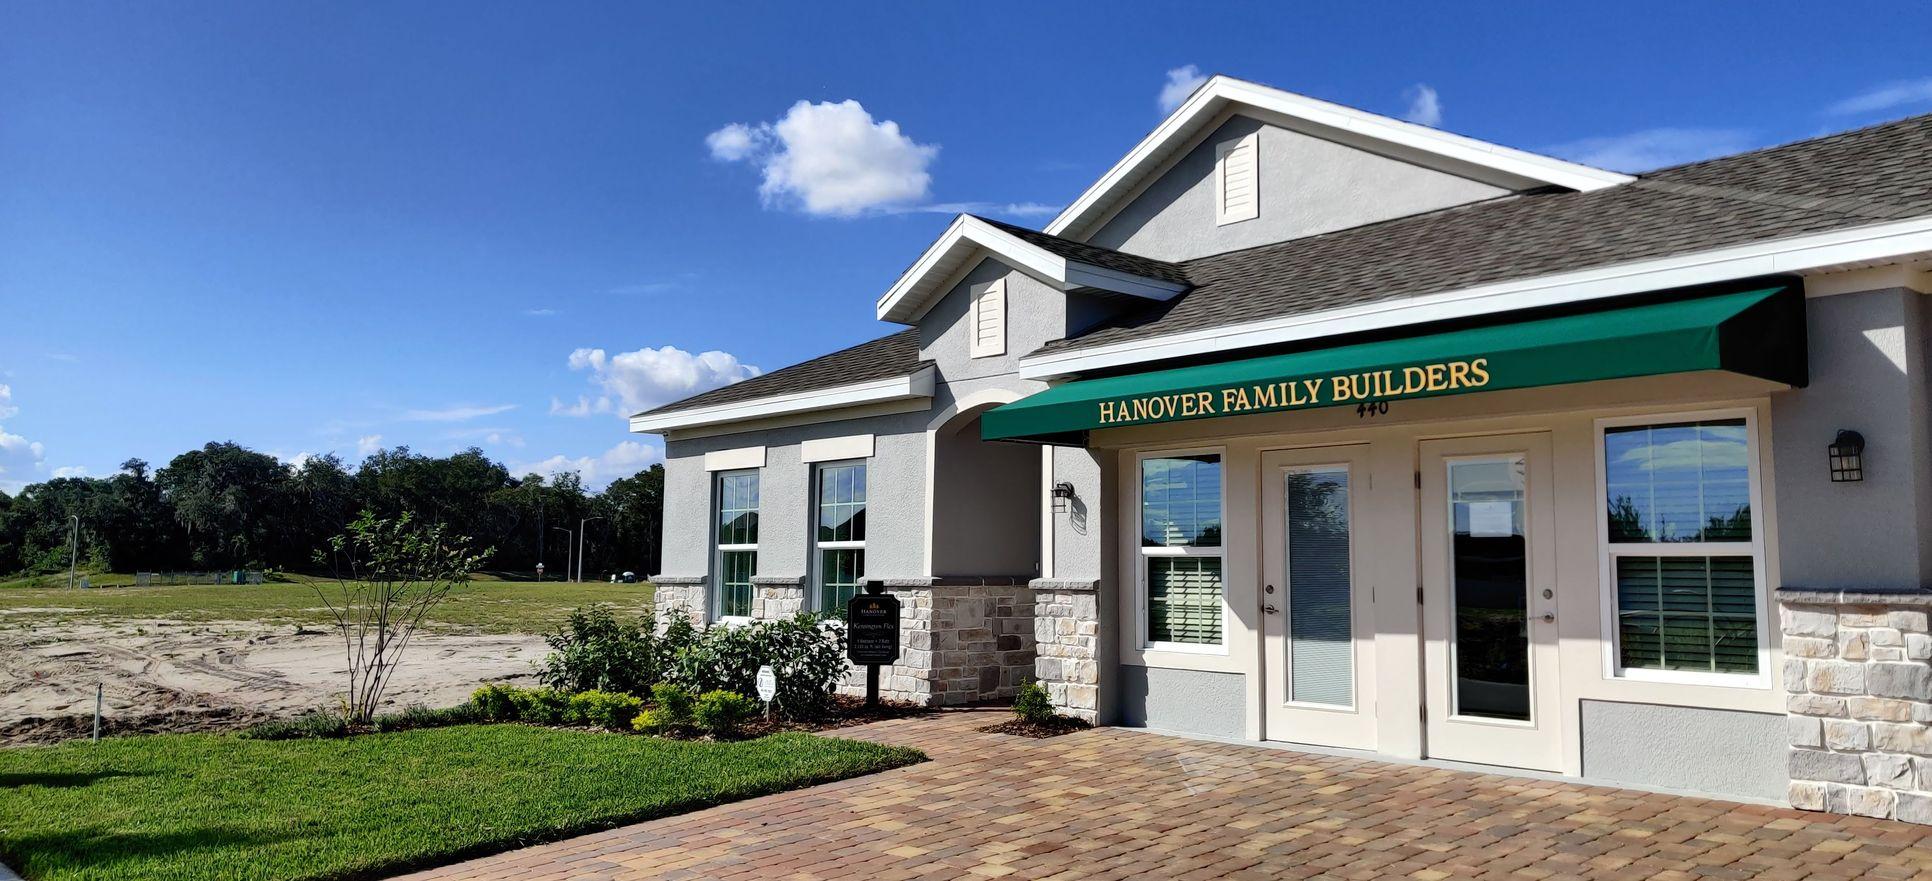 Kensington Flex Model Home with 3-Car Garage (set up as a sales office):Davenport Estates, Davenport, FL